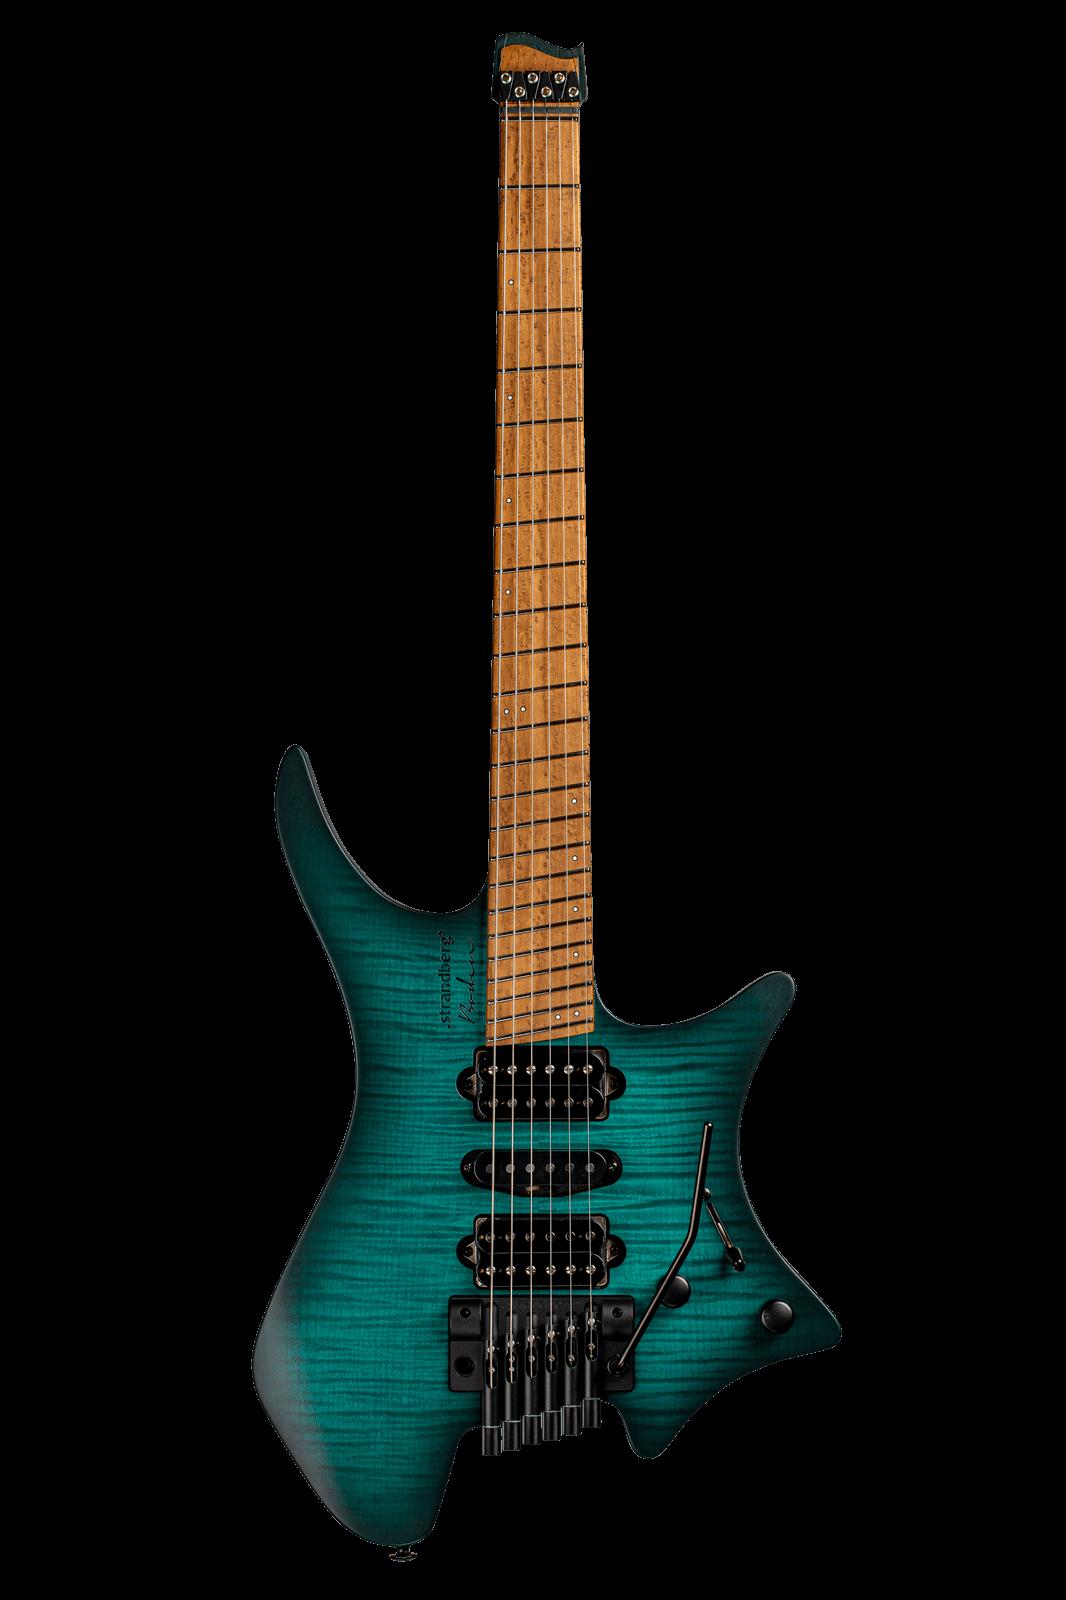 Headless Guitar Boden Metal 6 string trem trans teal front view